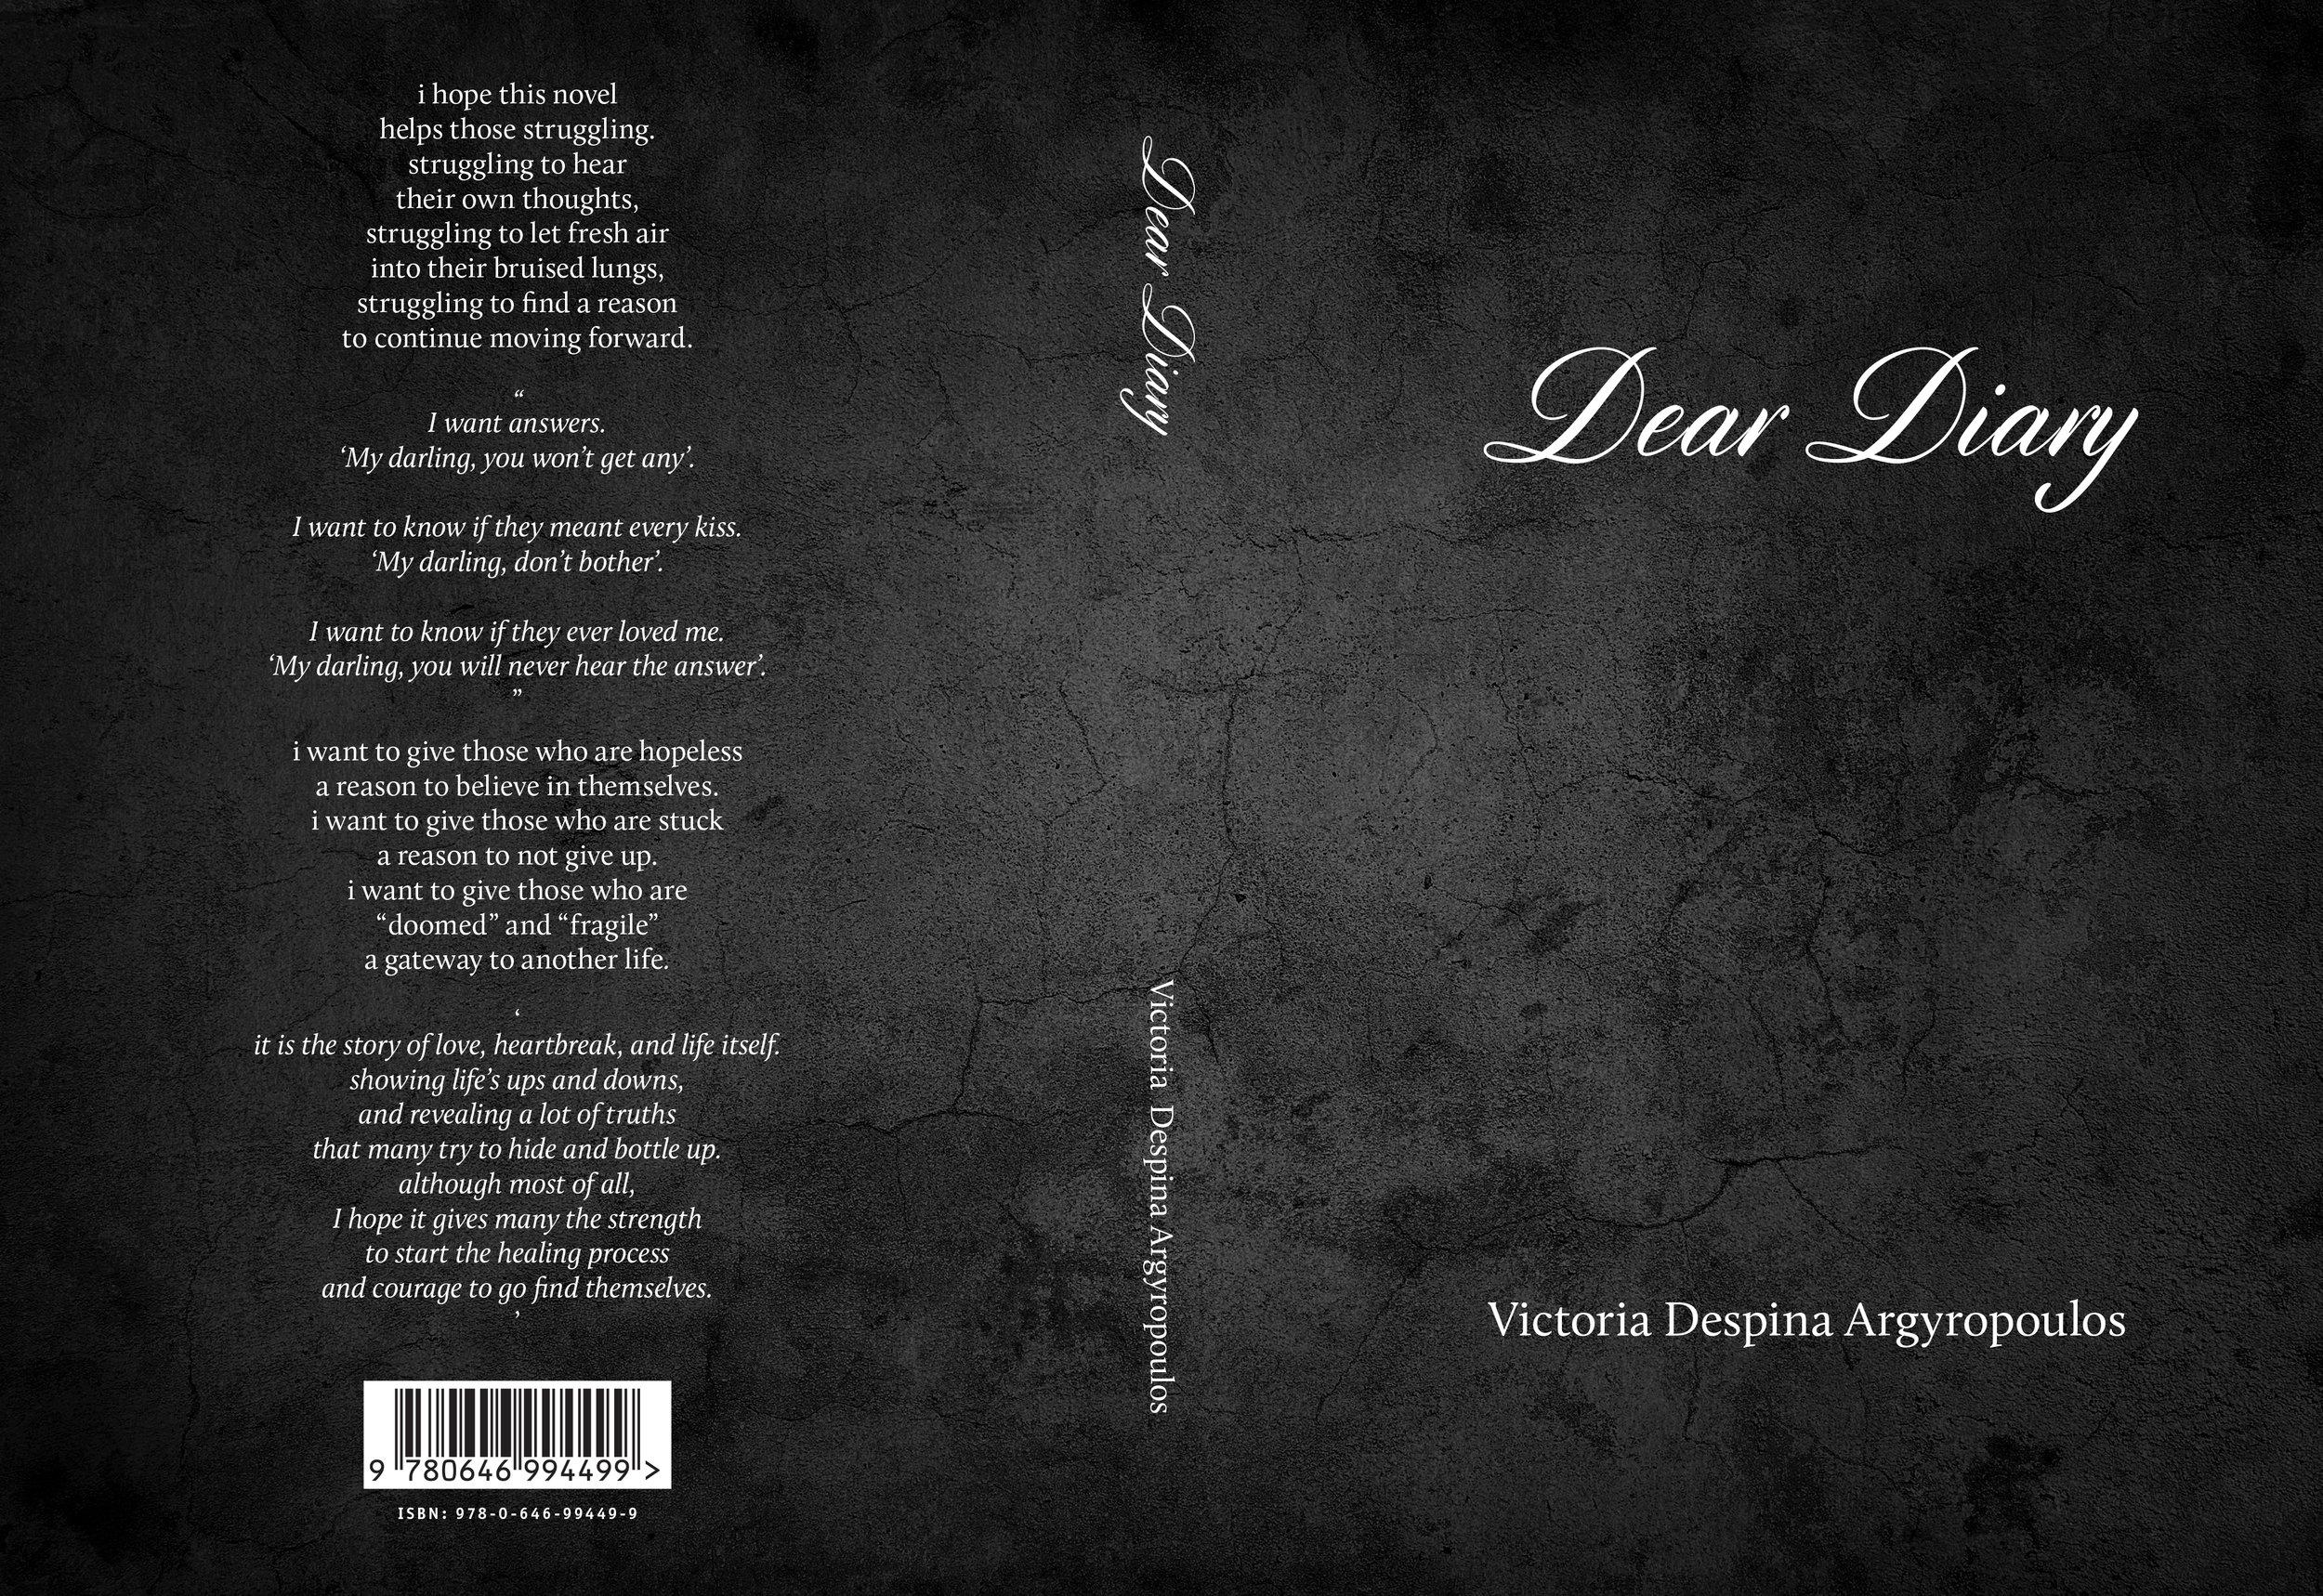 Dear Diary_cover_32mm.jpg